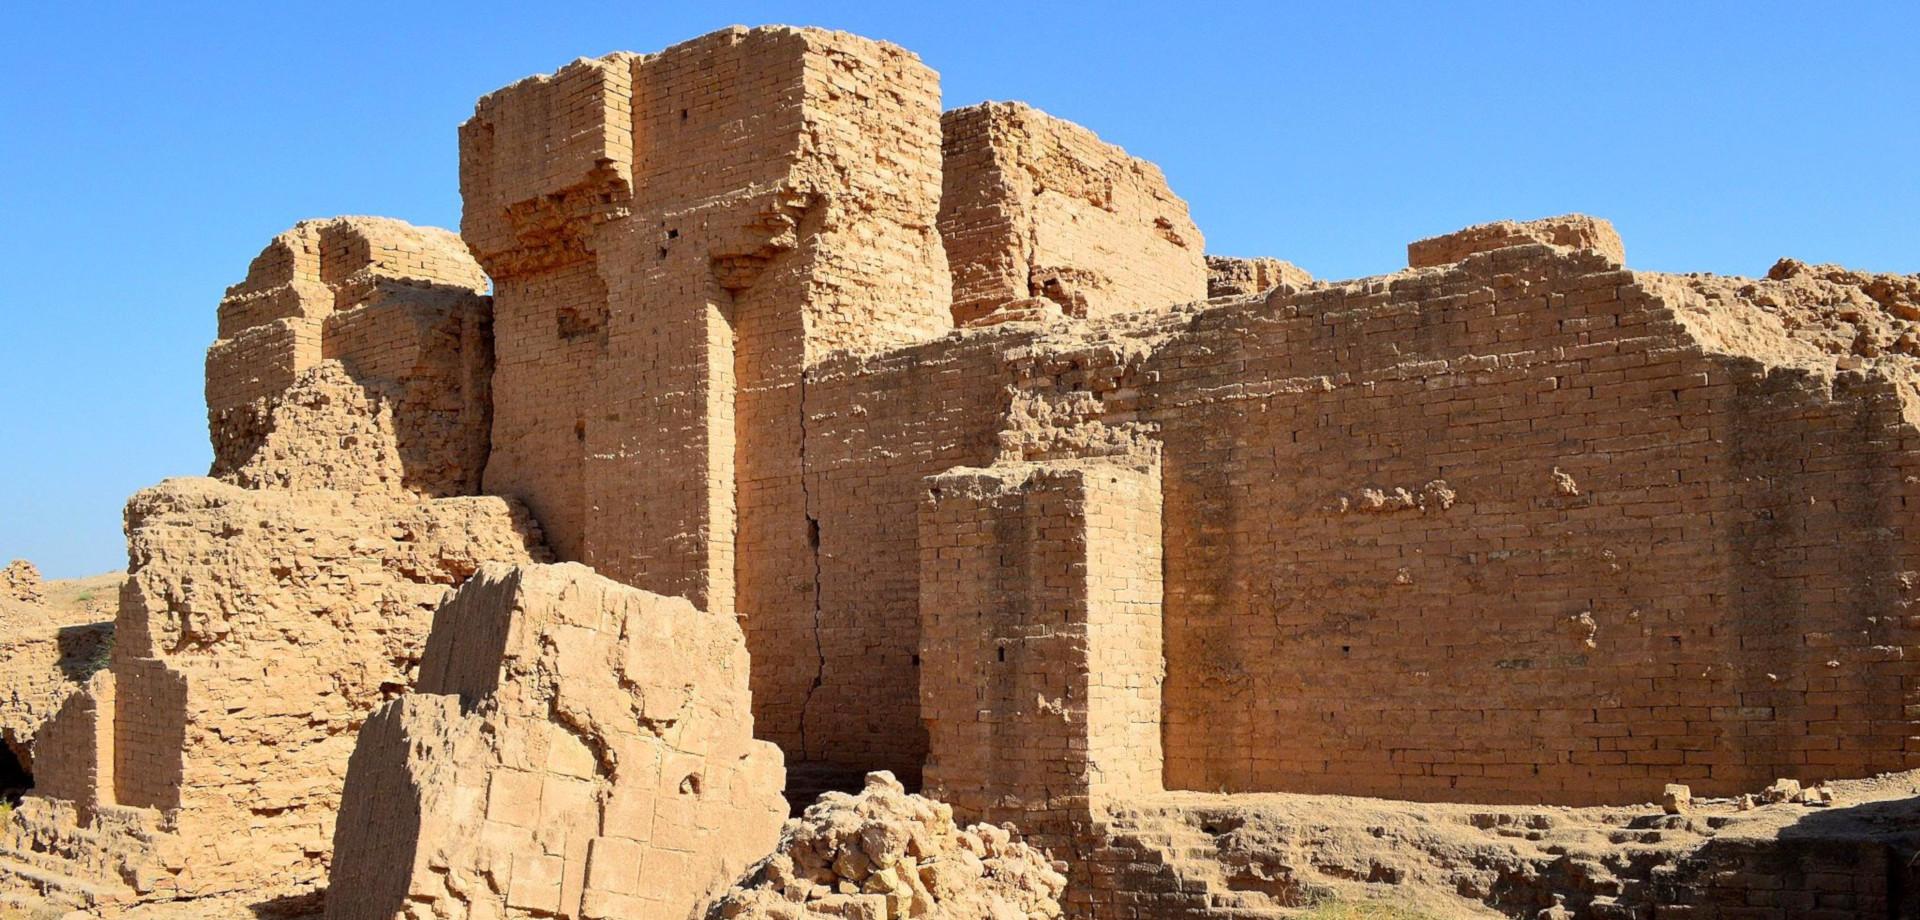 UNESCO Μνημεία Παγκόσμιας Κληρονομιάς